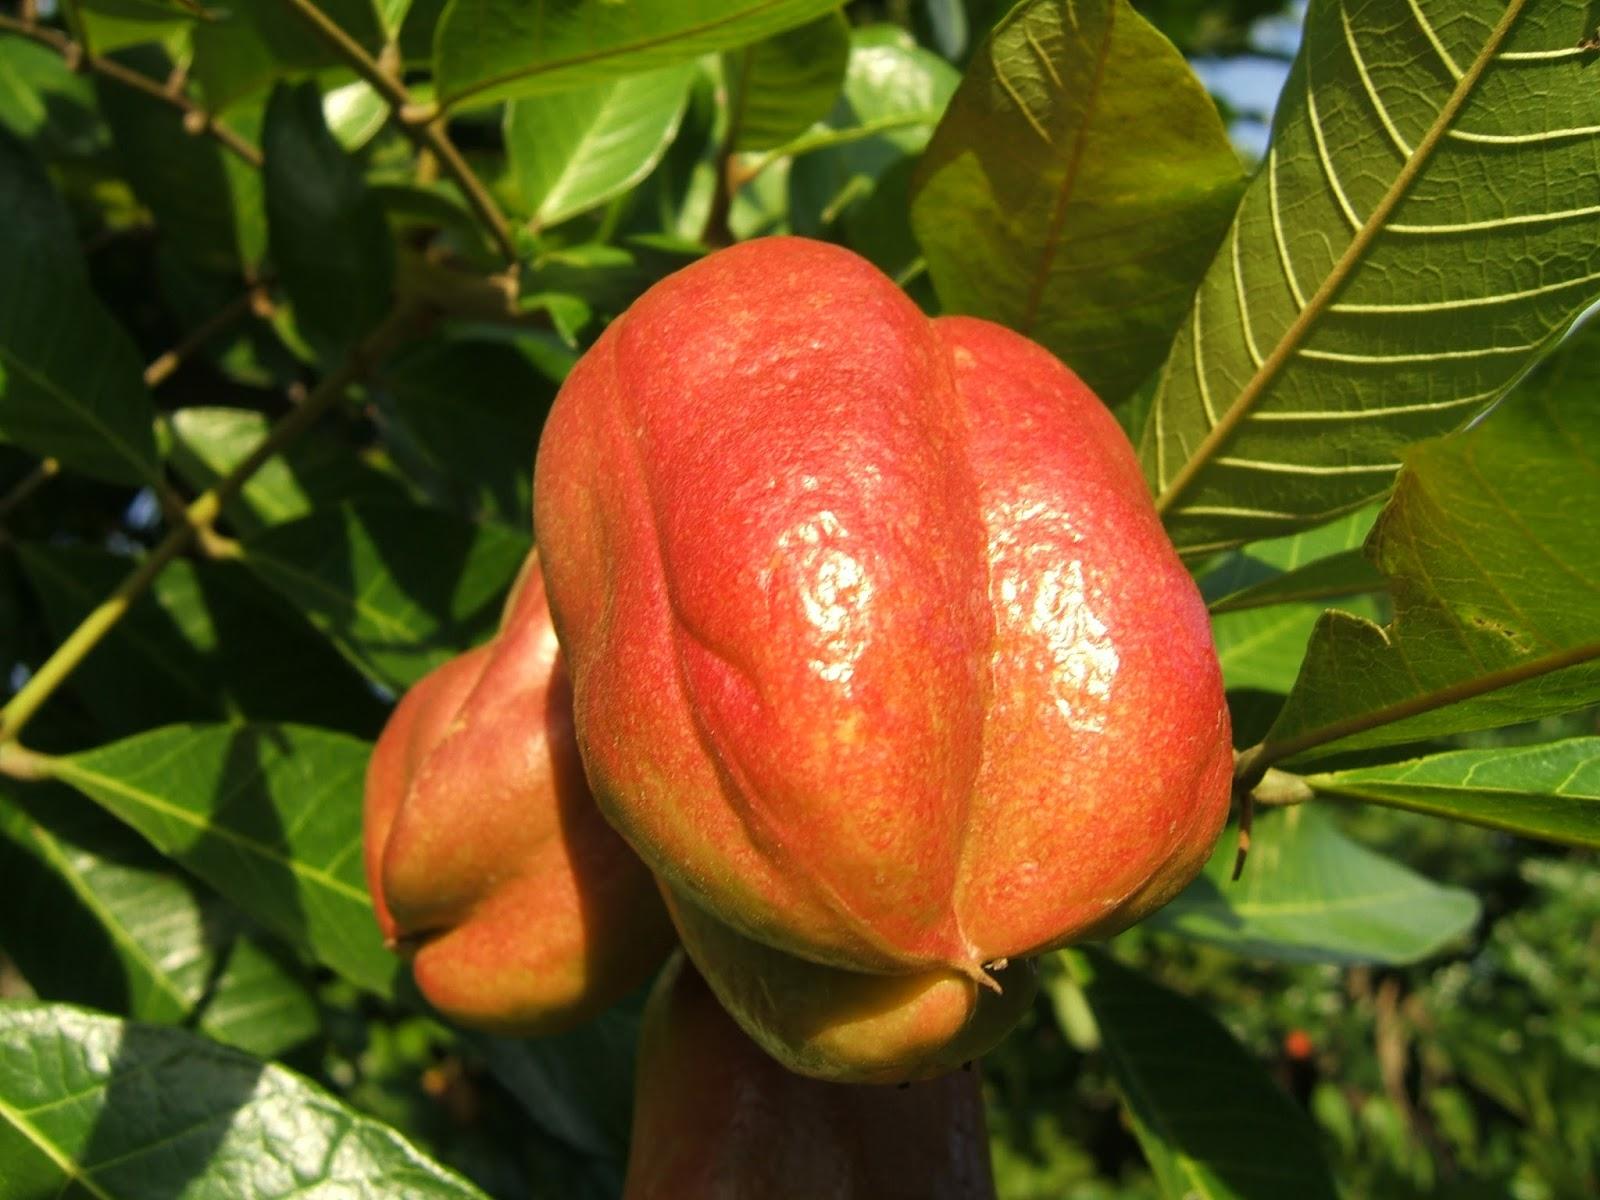 ackee fruta nacional da jamaica blog arco do verde rh arcodoverde blogspot com fruta nacional de venezuela fruta nacional de mexico